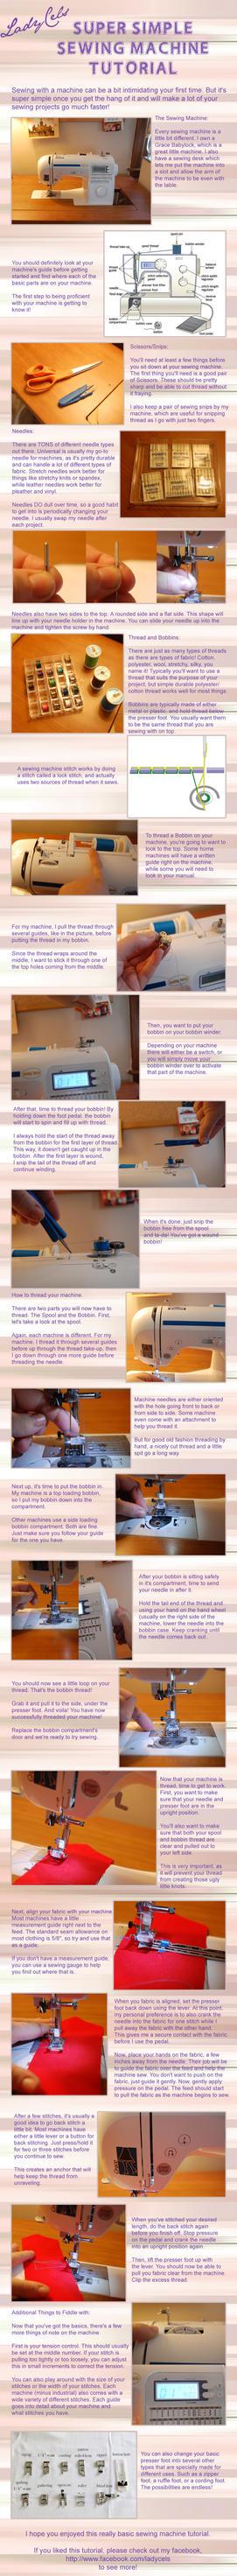 Super Simple Sewing Machine Tutorial by DragonLadyCels